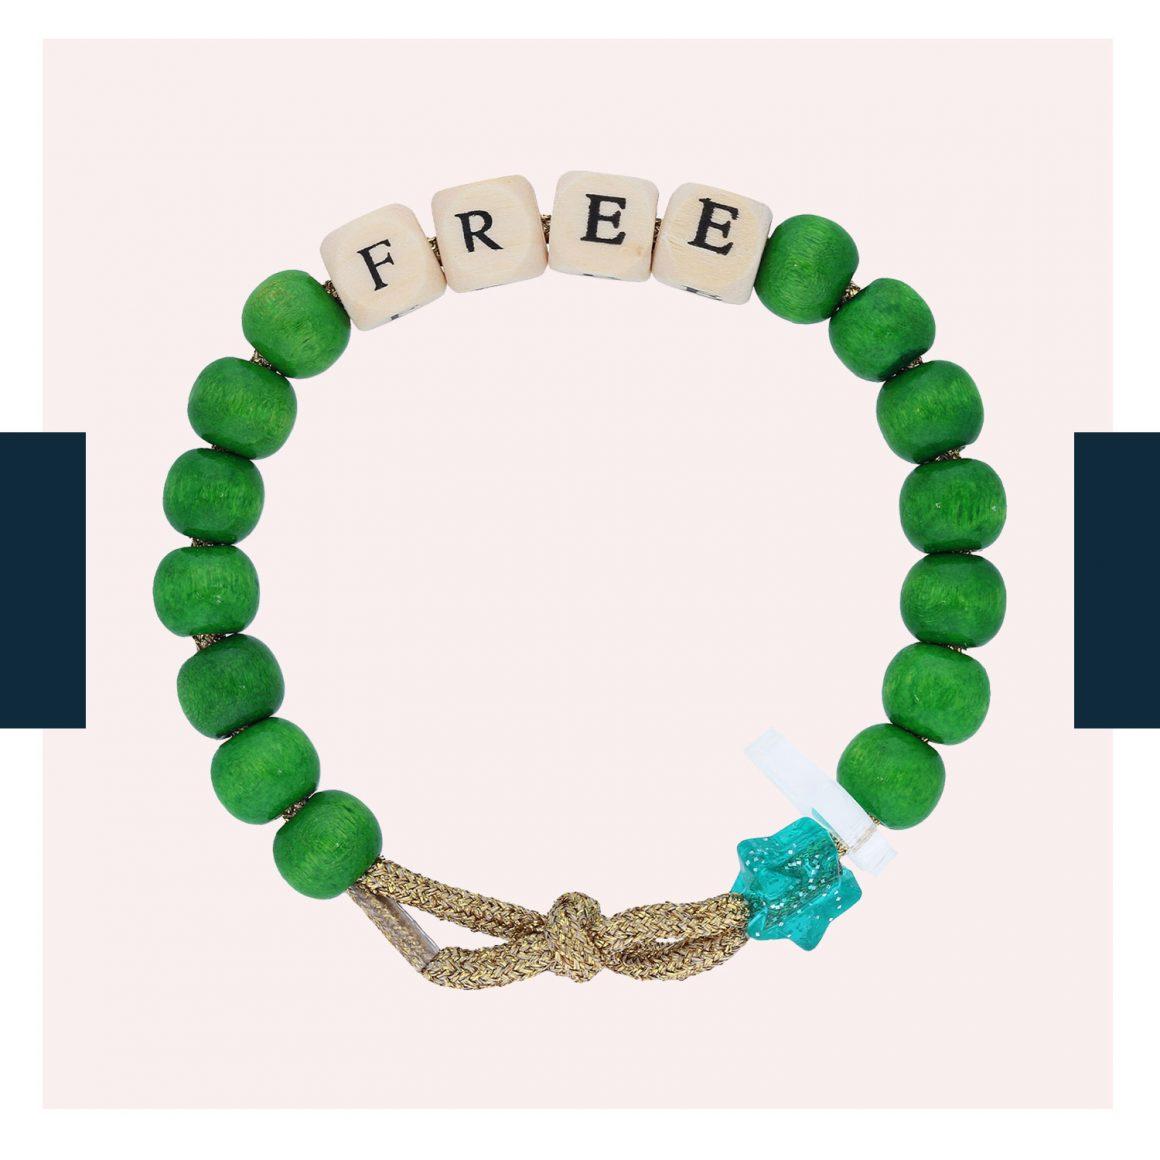 Le bracelet Love Beads « Free » à perles vertes de Lauren Rubinski